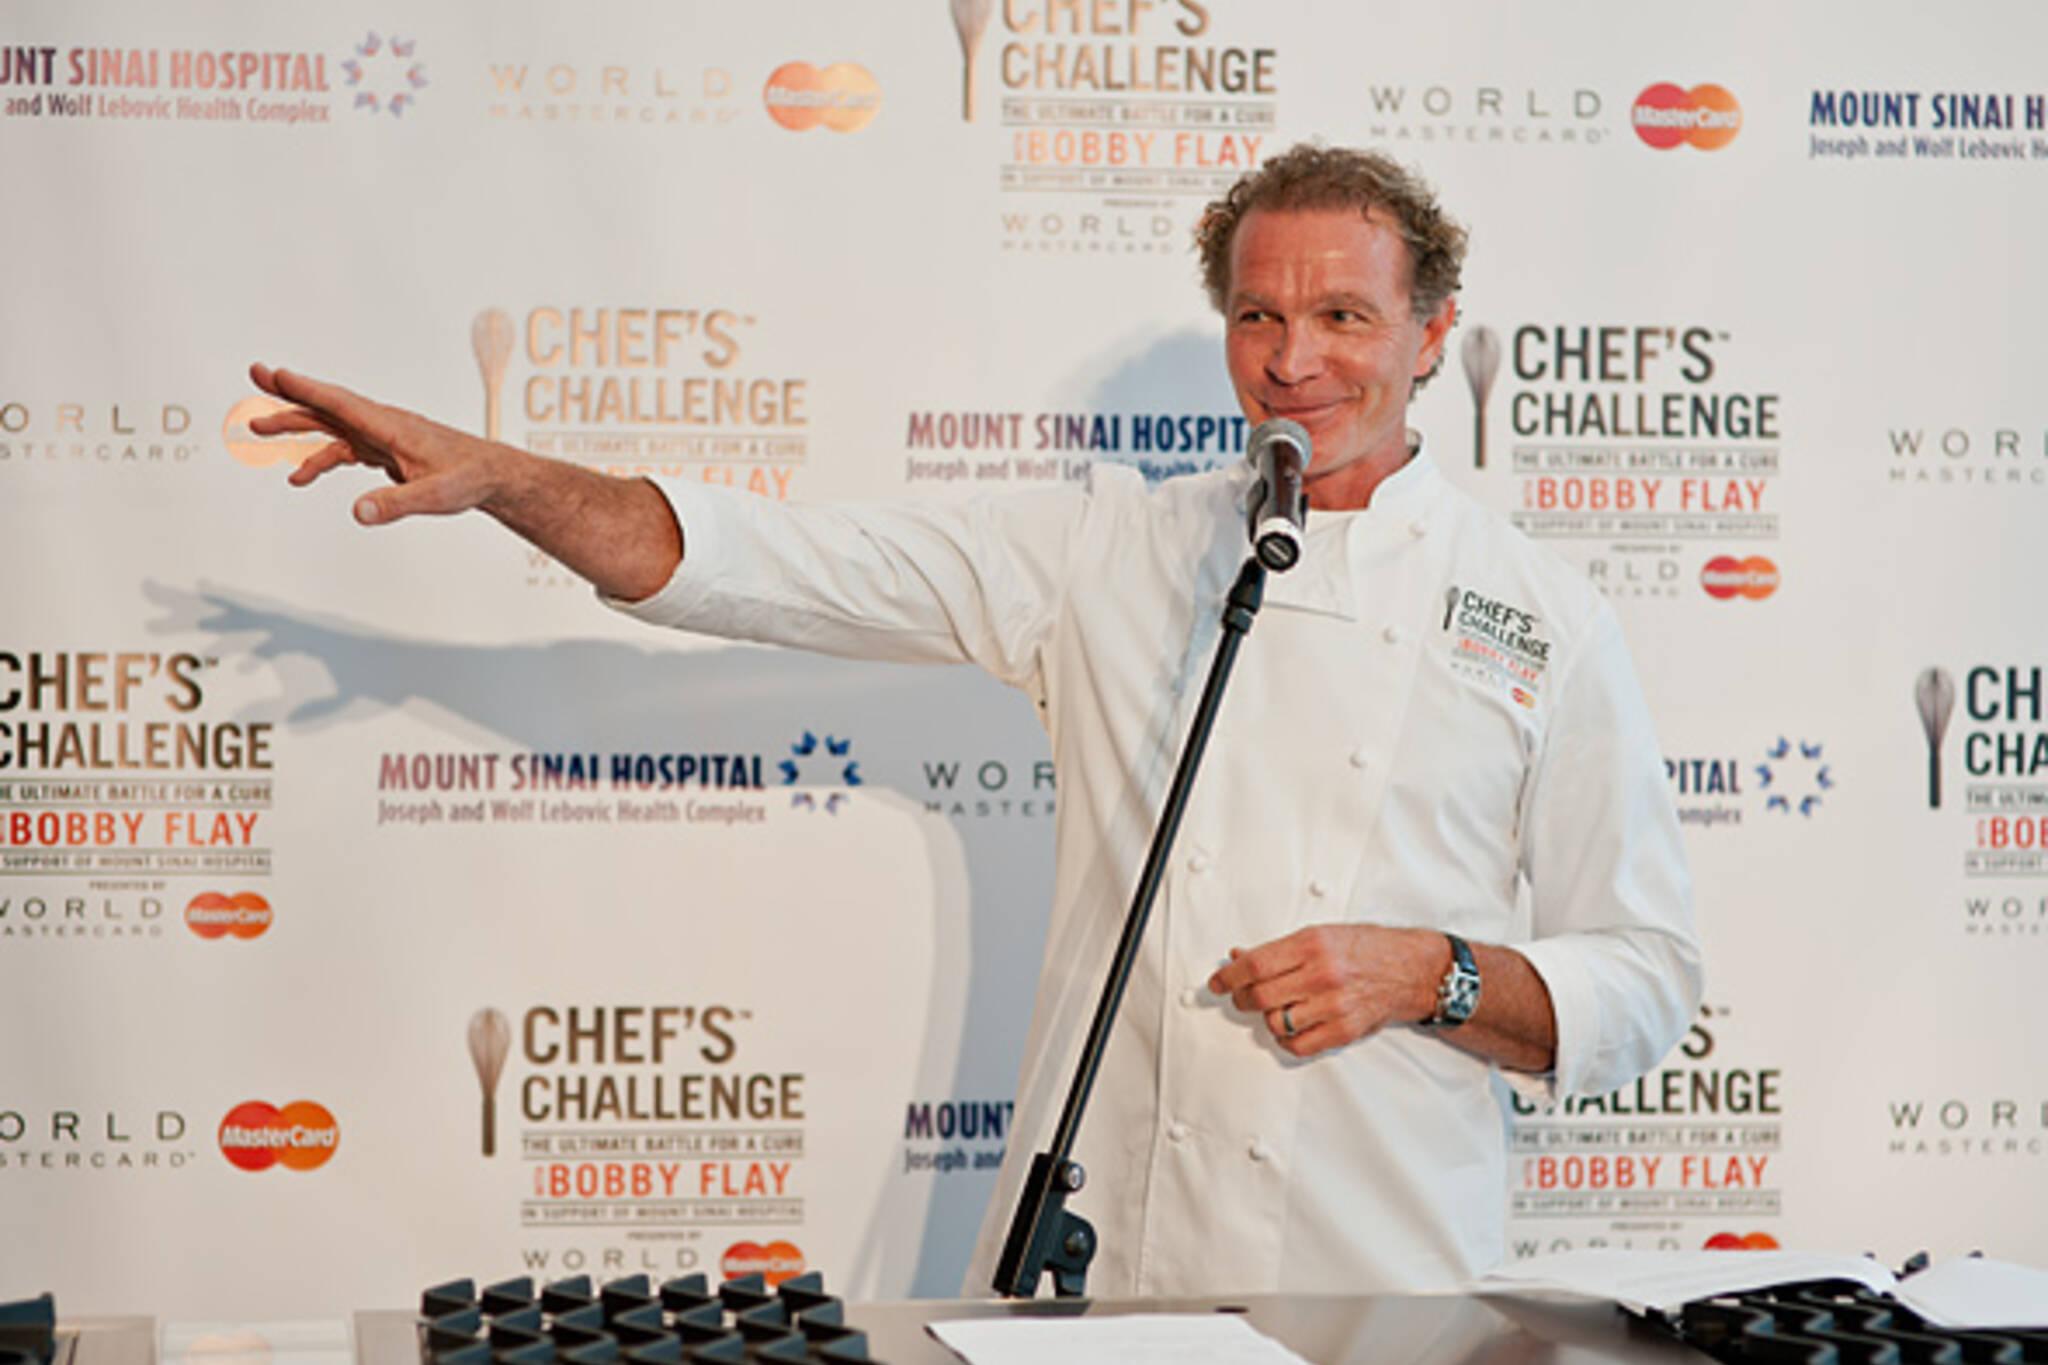 Chef's Challenge Toronto